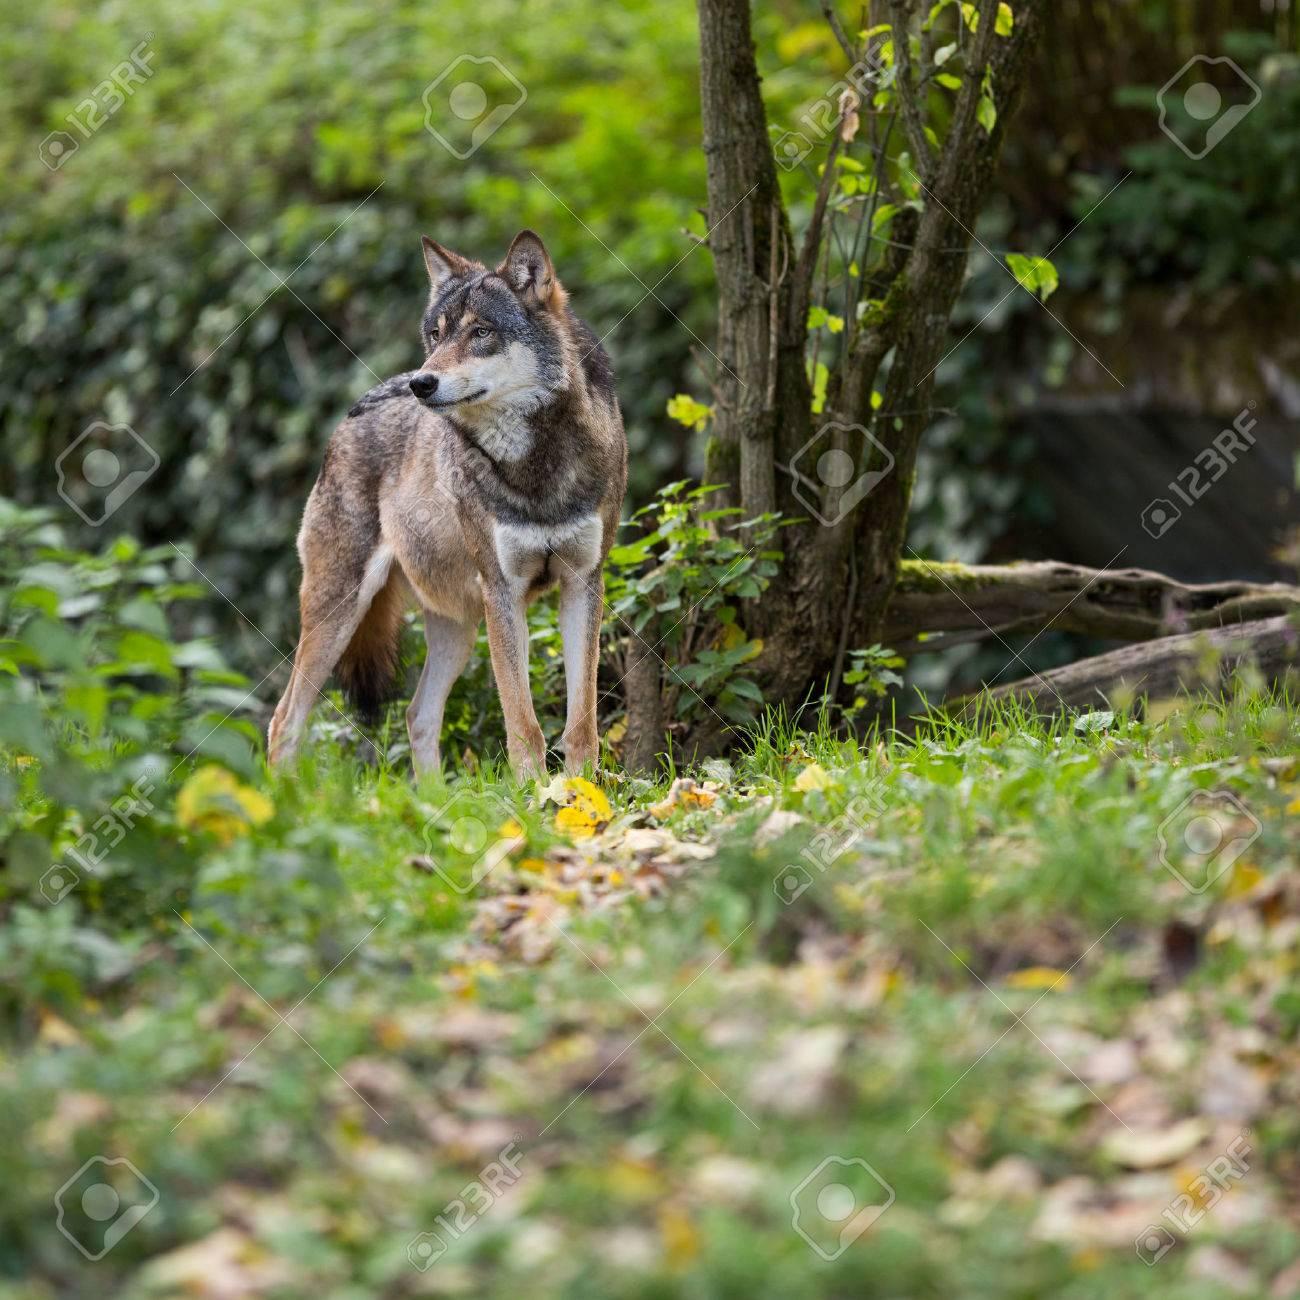 Gris / loup eurasienne (Canis lupus) Banque d'images - 49271739